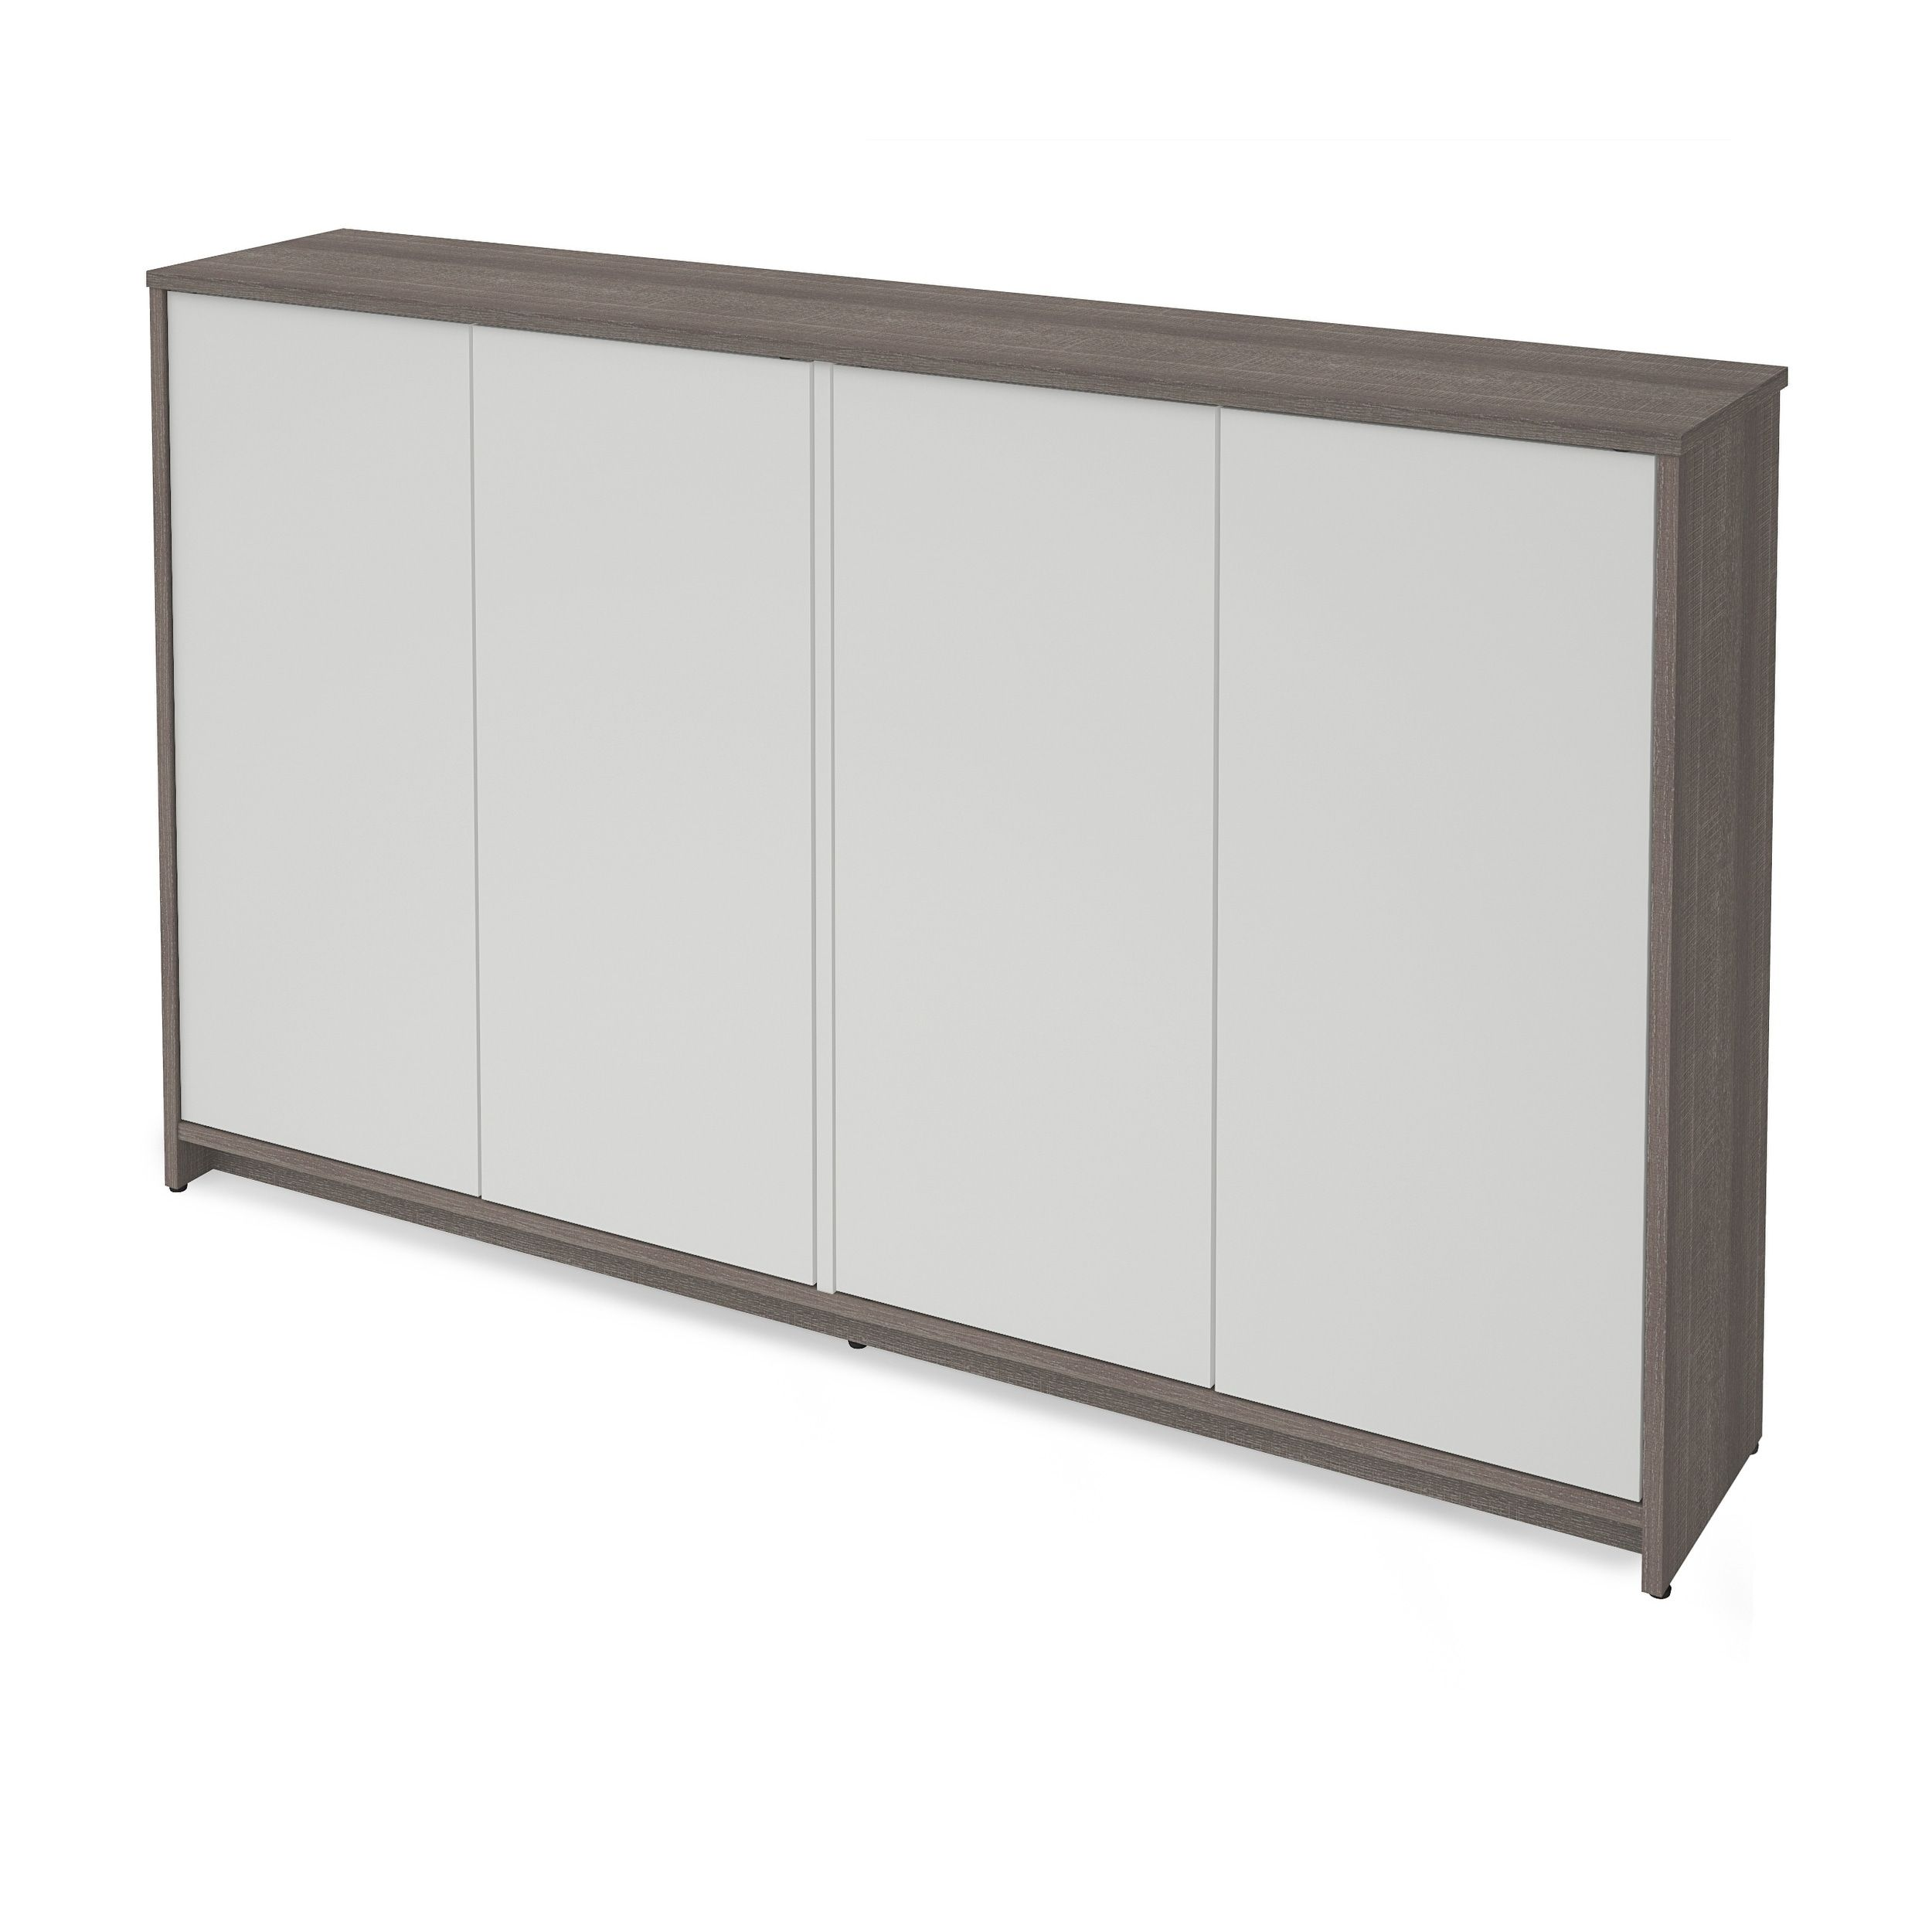 Bestar small space inch storage unit bark greywhite in